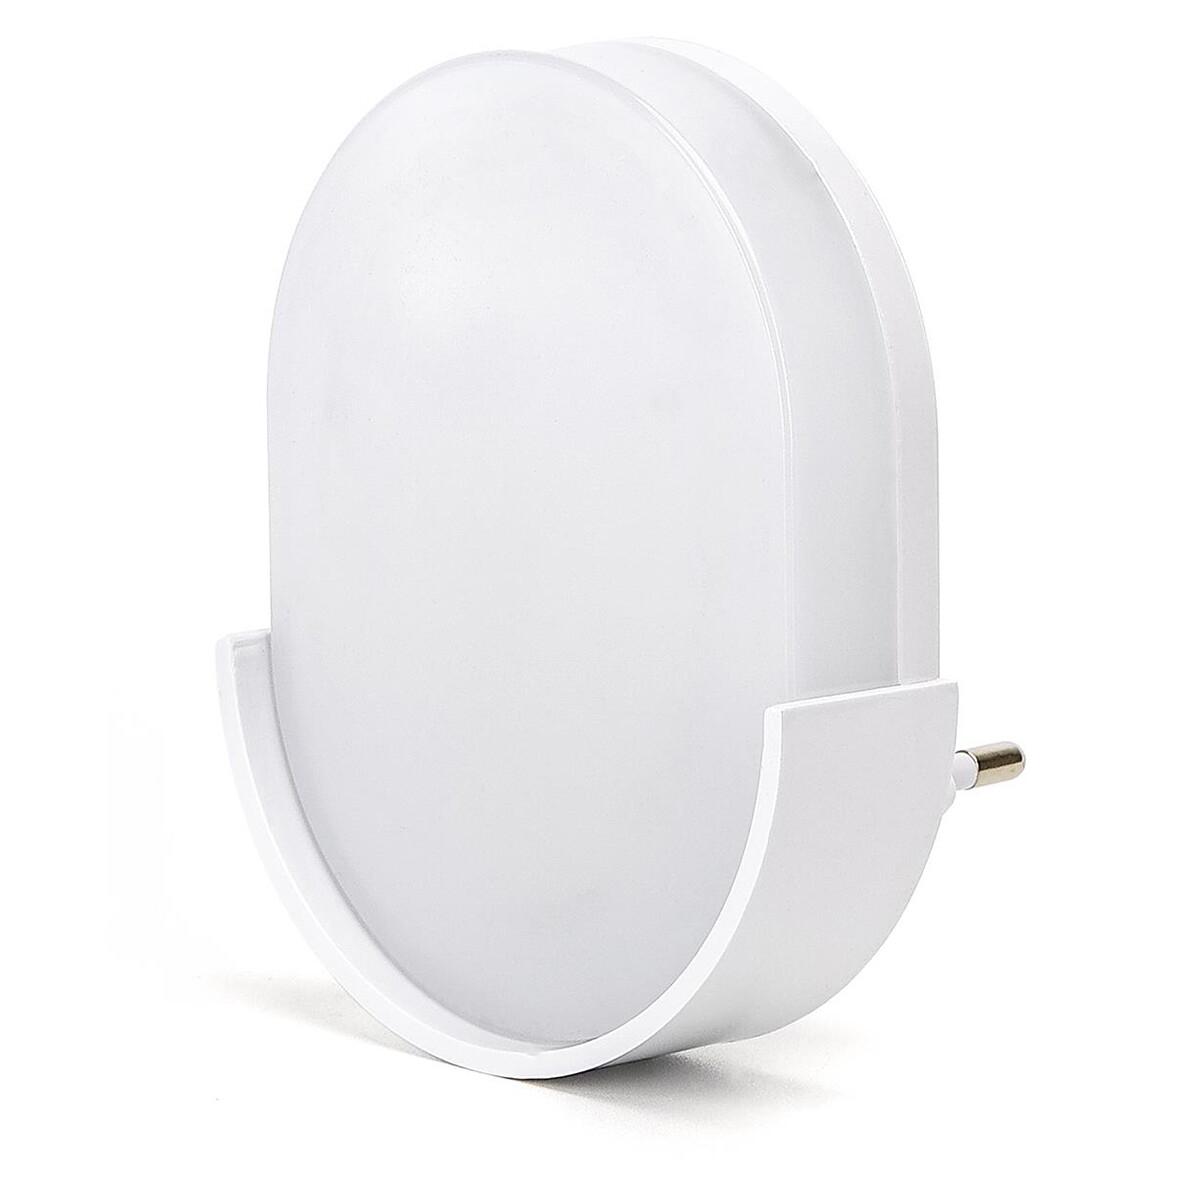 Stekkerlamp Lamp - Stekkerspot met Dag en Nacht Sensor - Aigi Sipas - 1W - Helder/Koud Wit 6500K - O